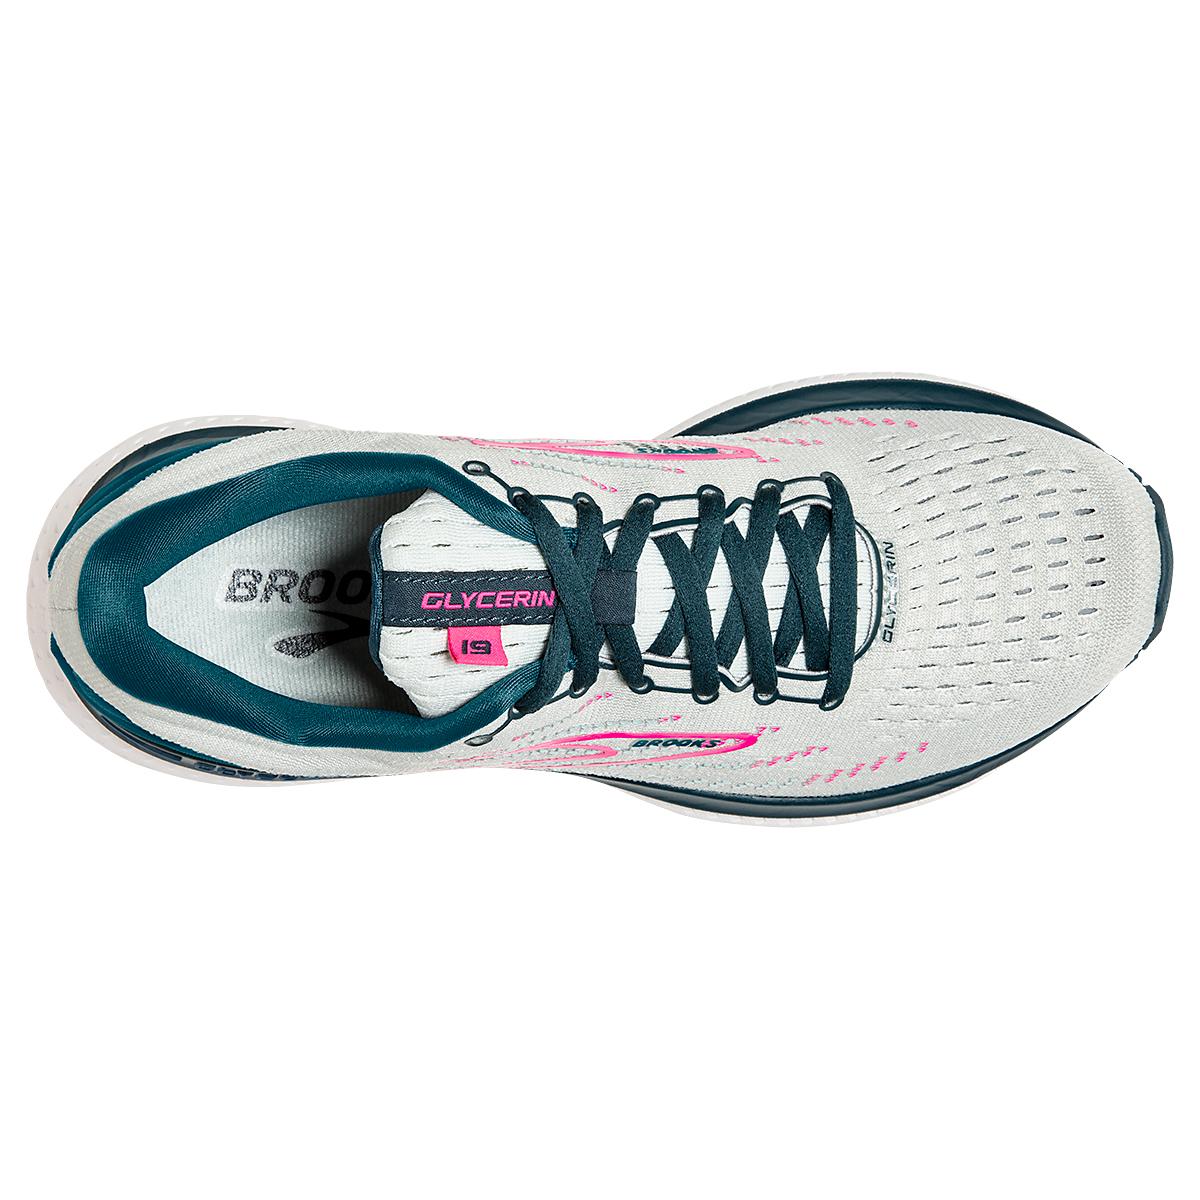 Women's Brooks Glycerin 19 Running Shoe - Color: Ice Flow/Navy - Size: 5 - Width: Regular, Ice Flow/Navy, large, image 2